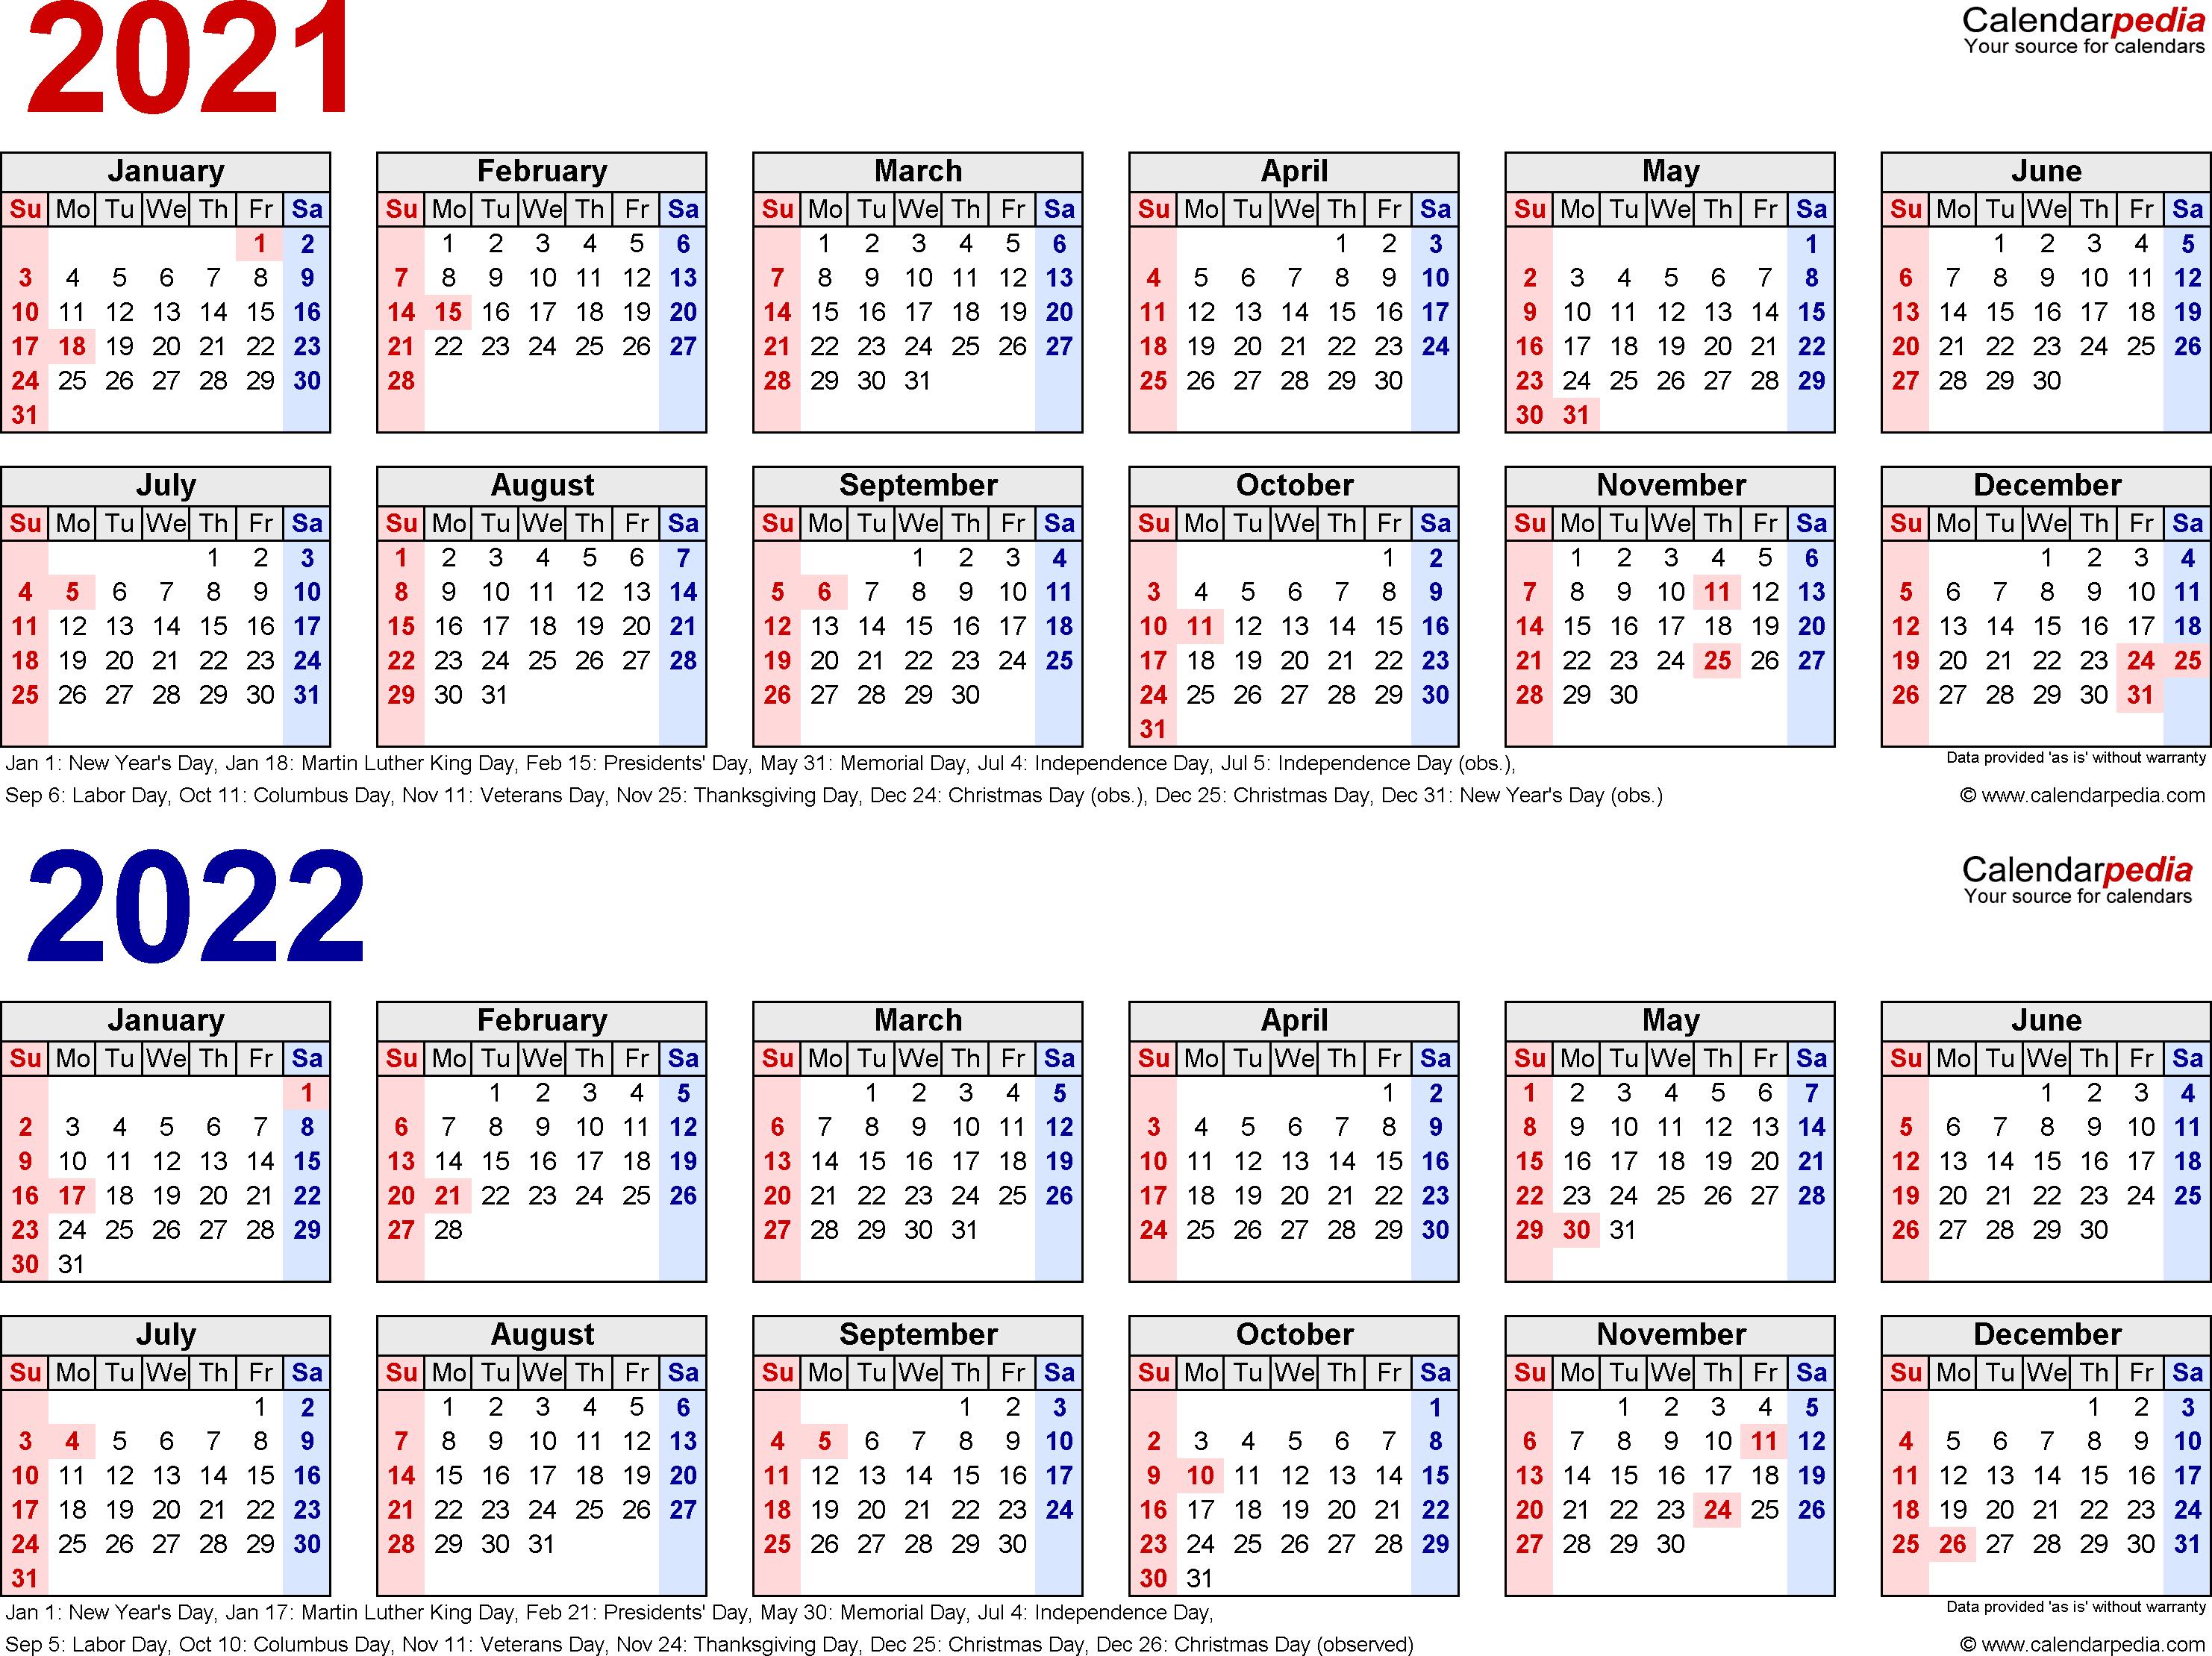 5 Year Calendar Printable - Wpa.wpart.co in Free Printable Calendar 2020-2022